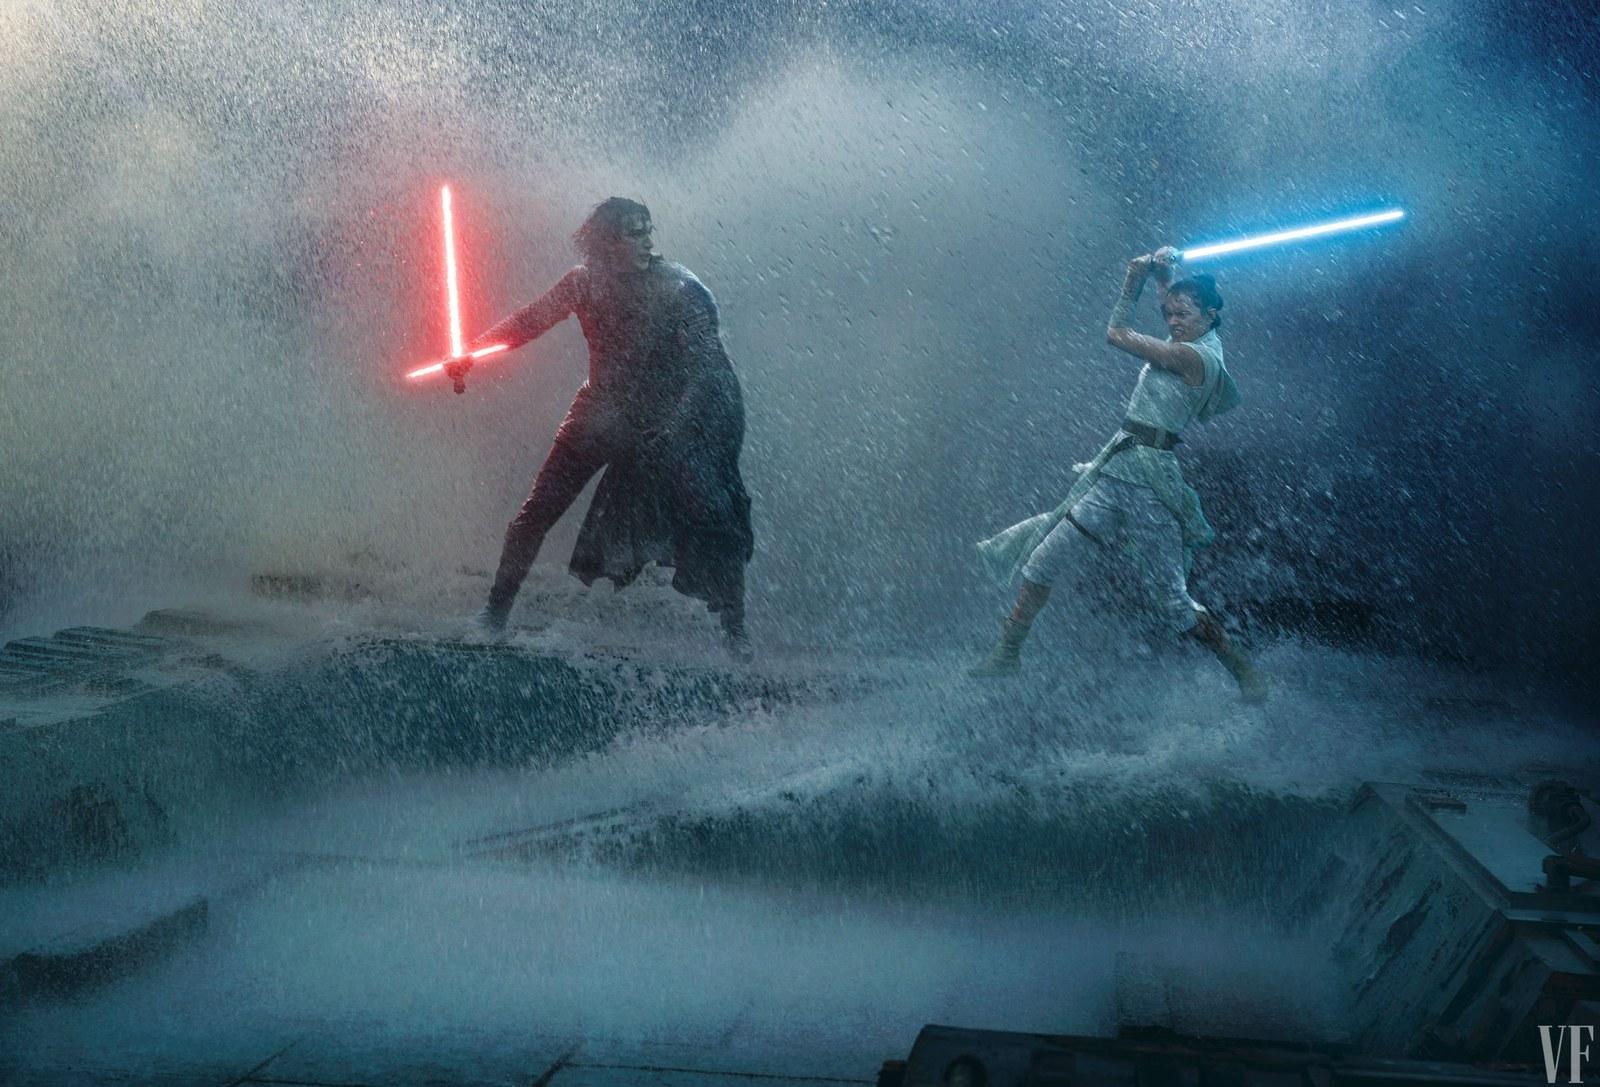 Vanity Fair exposes The Rise of Skywalker characters, details